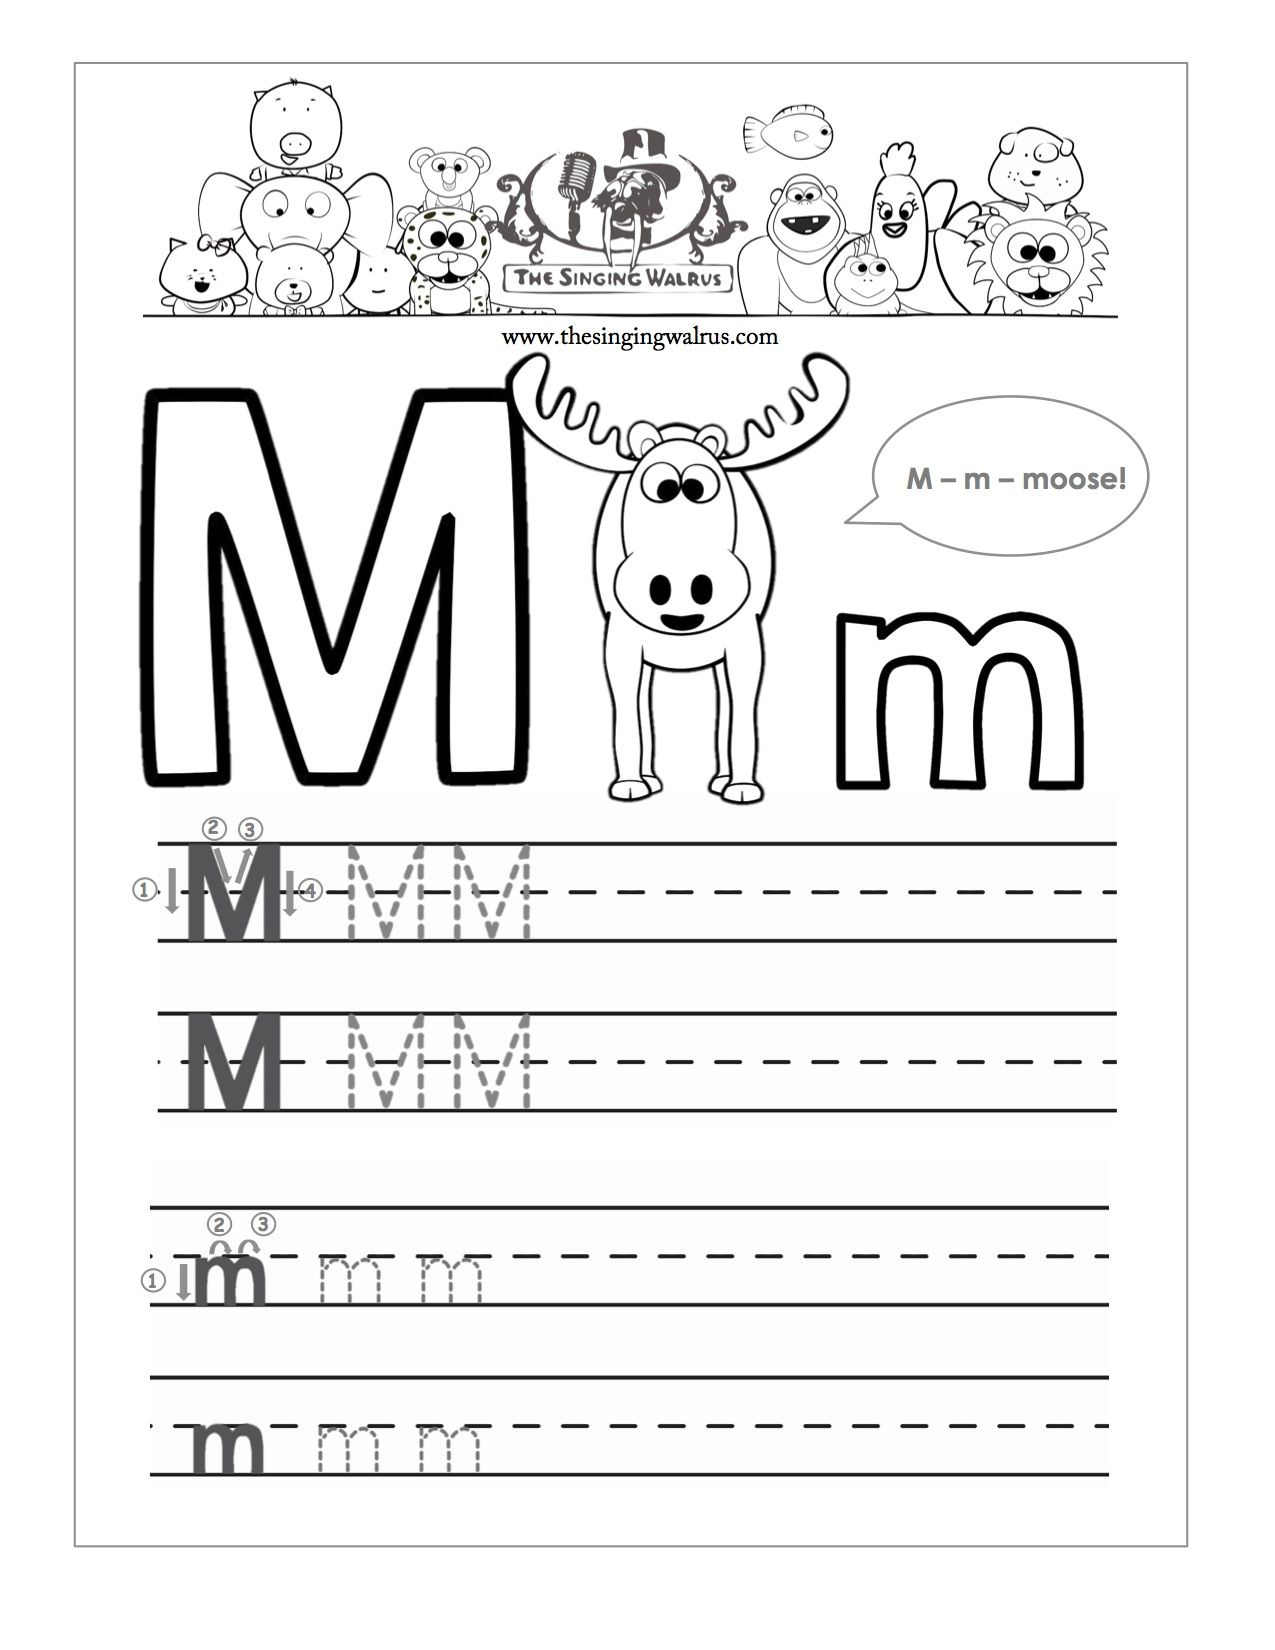 Beautiful Letter M Writing Worksheet | Educational Worksheet throughout Letter M Tracing Worksheets Preschool